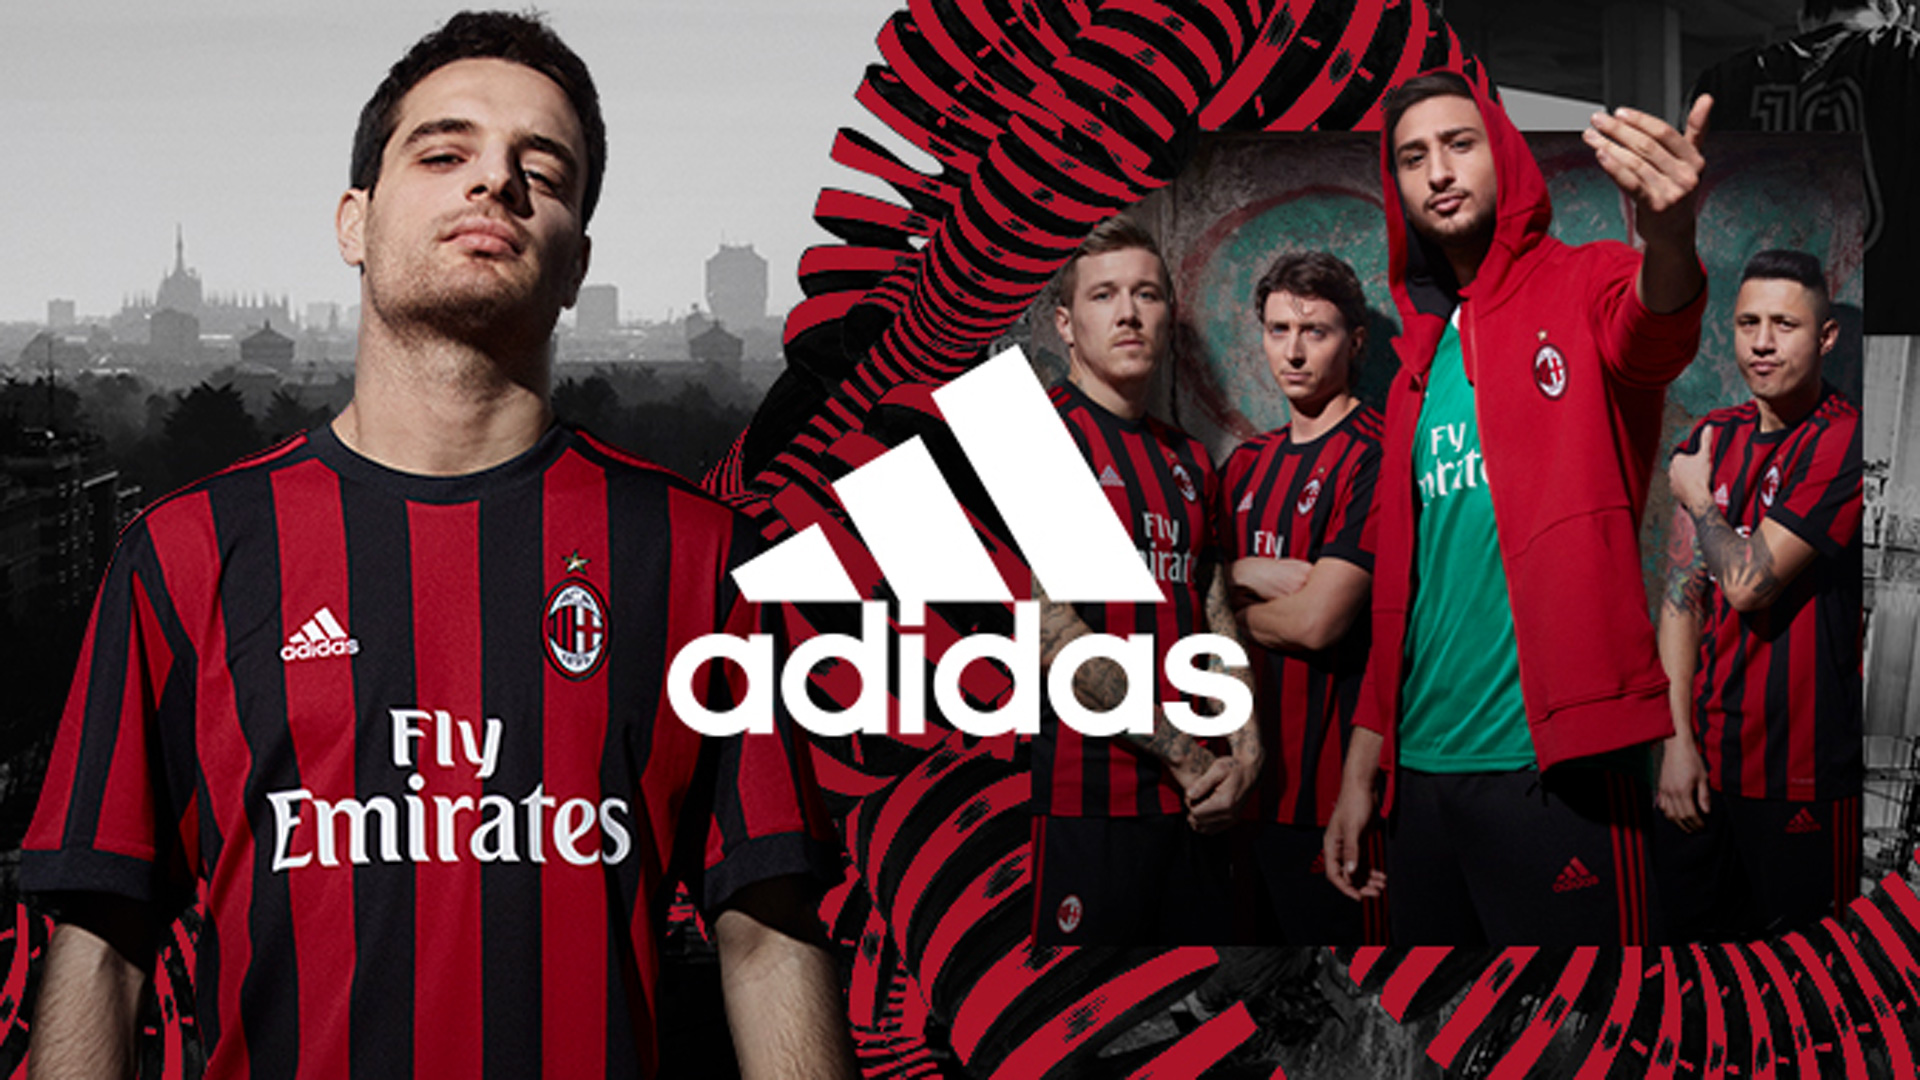 GdS - Il Milan perde gli sponsor: Adidas e Audi salutano i rossoneri